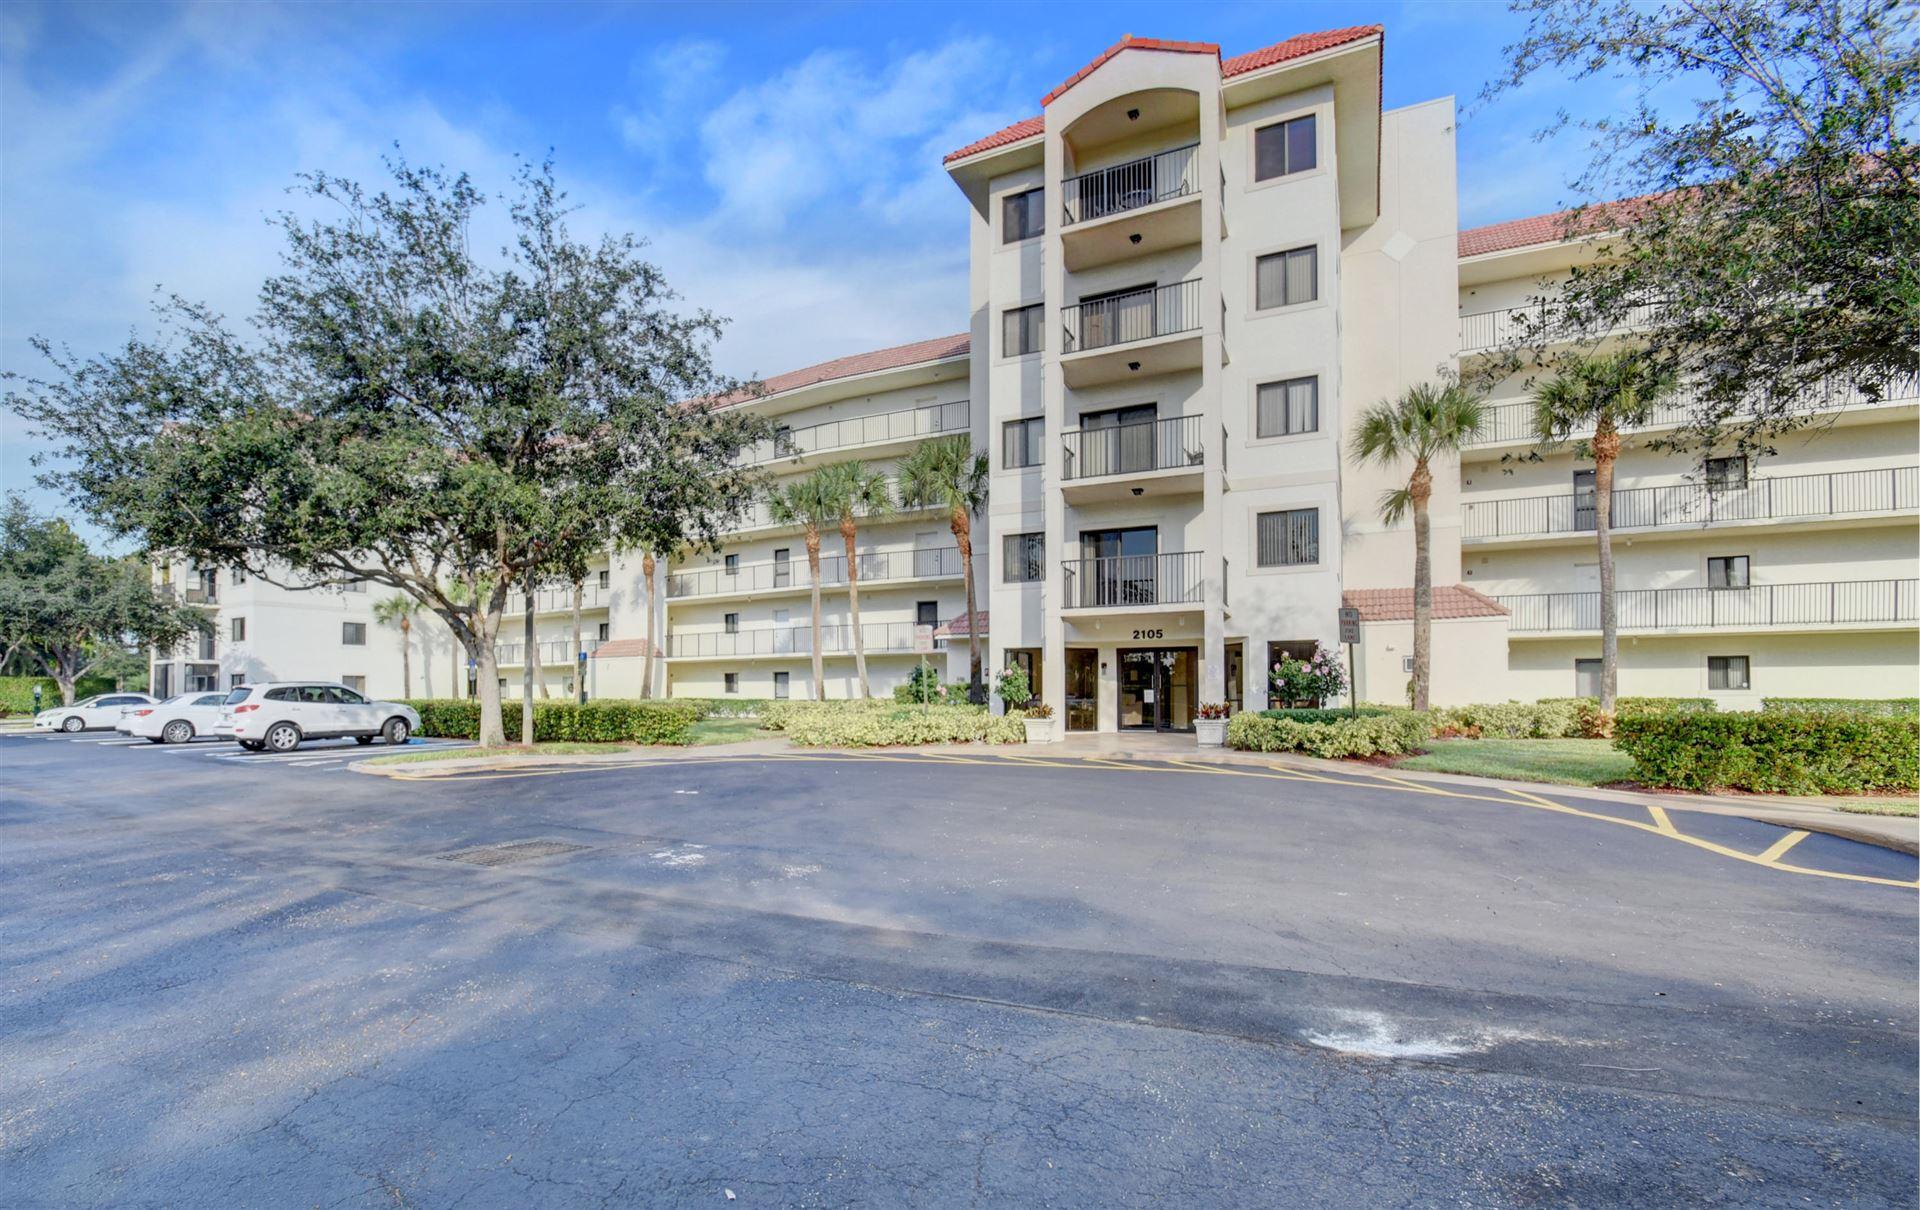 2105 Lavers Circle #109, Delray Beach, FL 33444 - #: RX-10646614